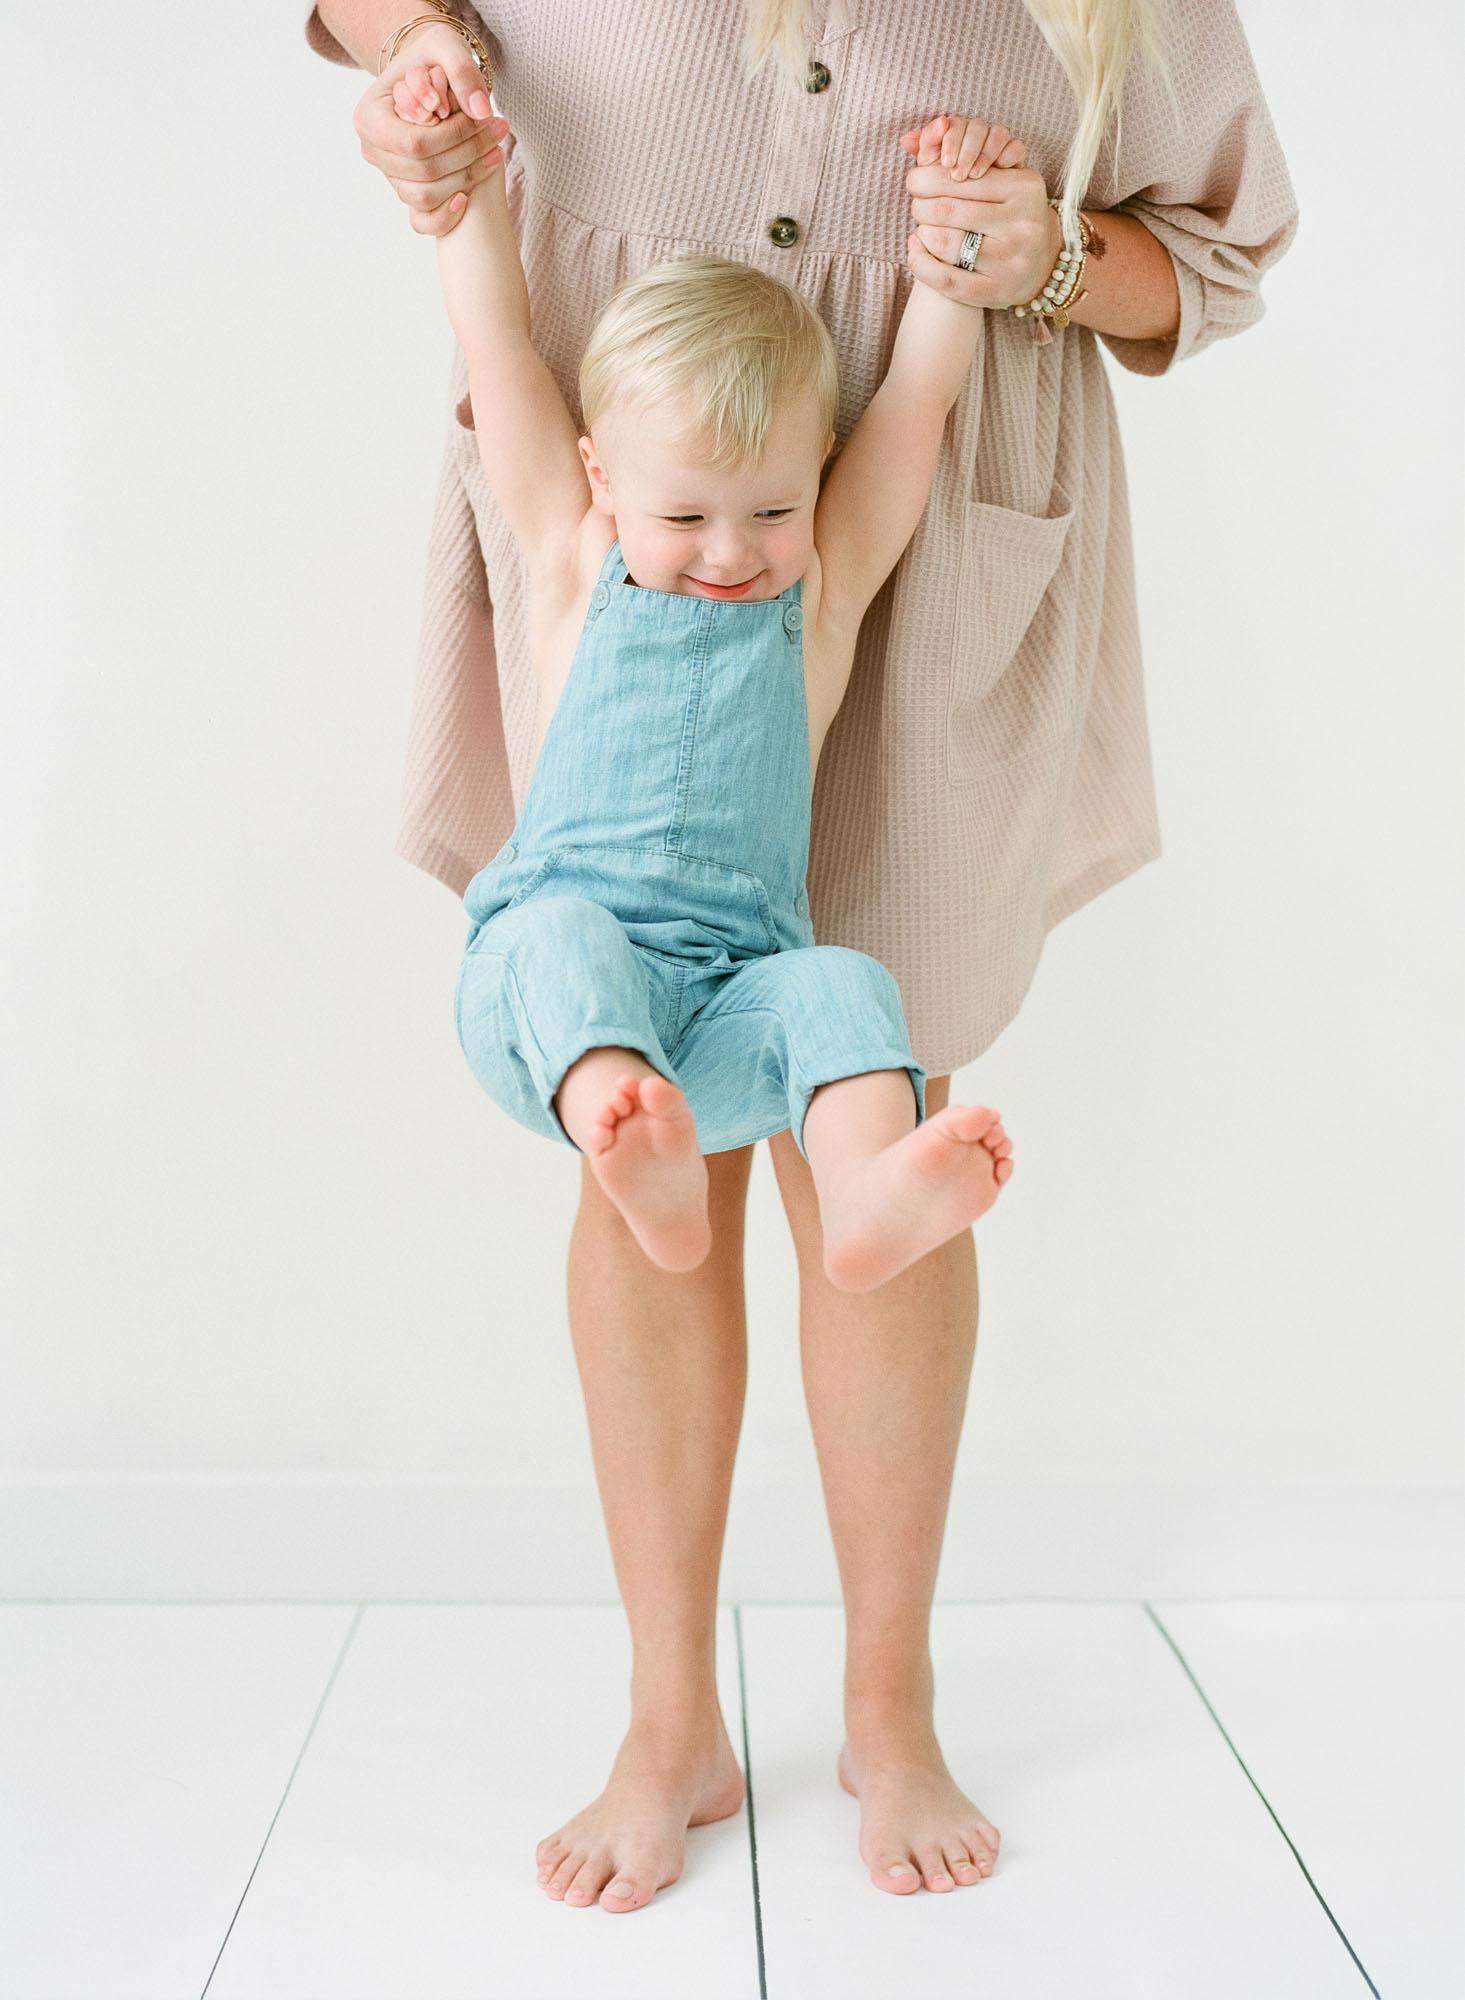 wake-forest-family-photographer-studio-session-motherhood